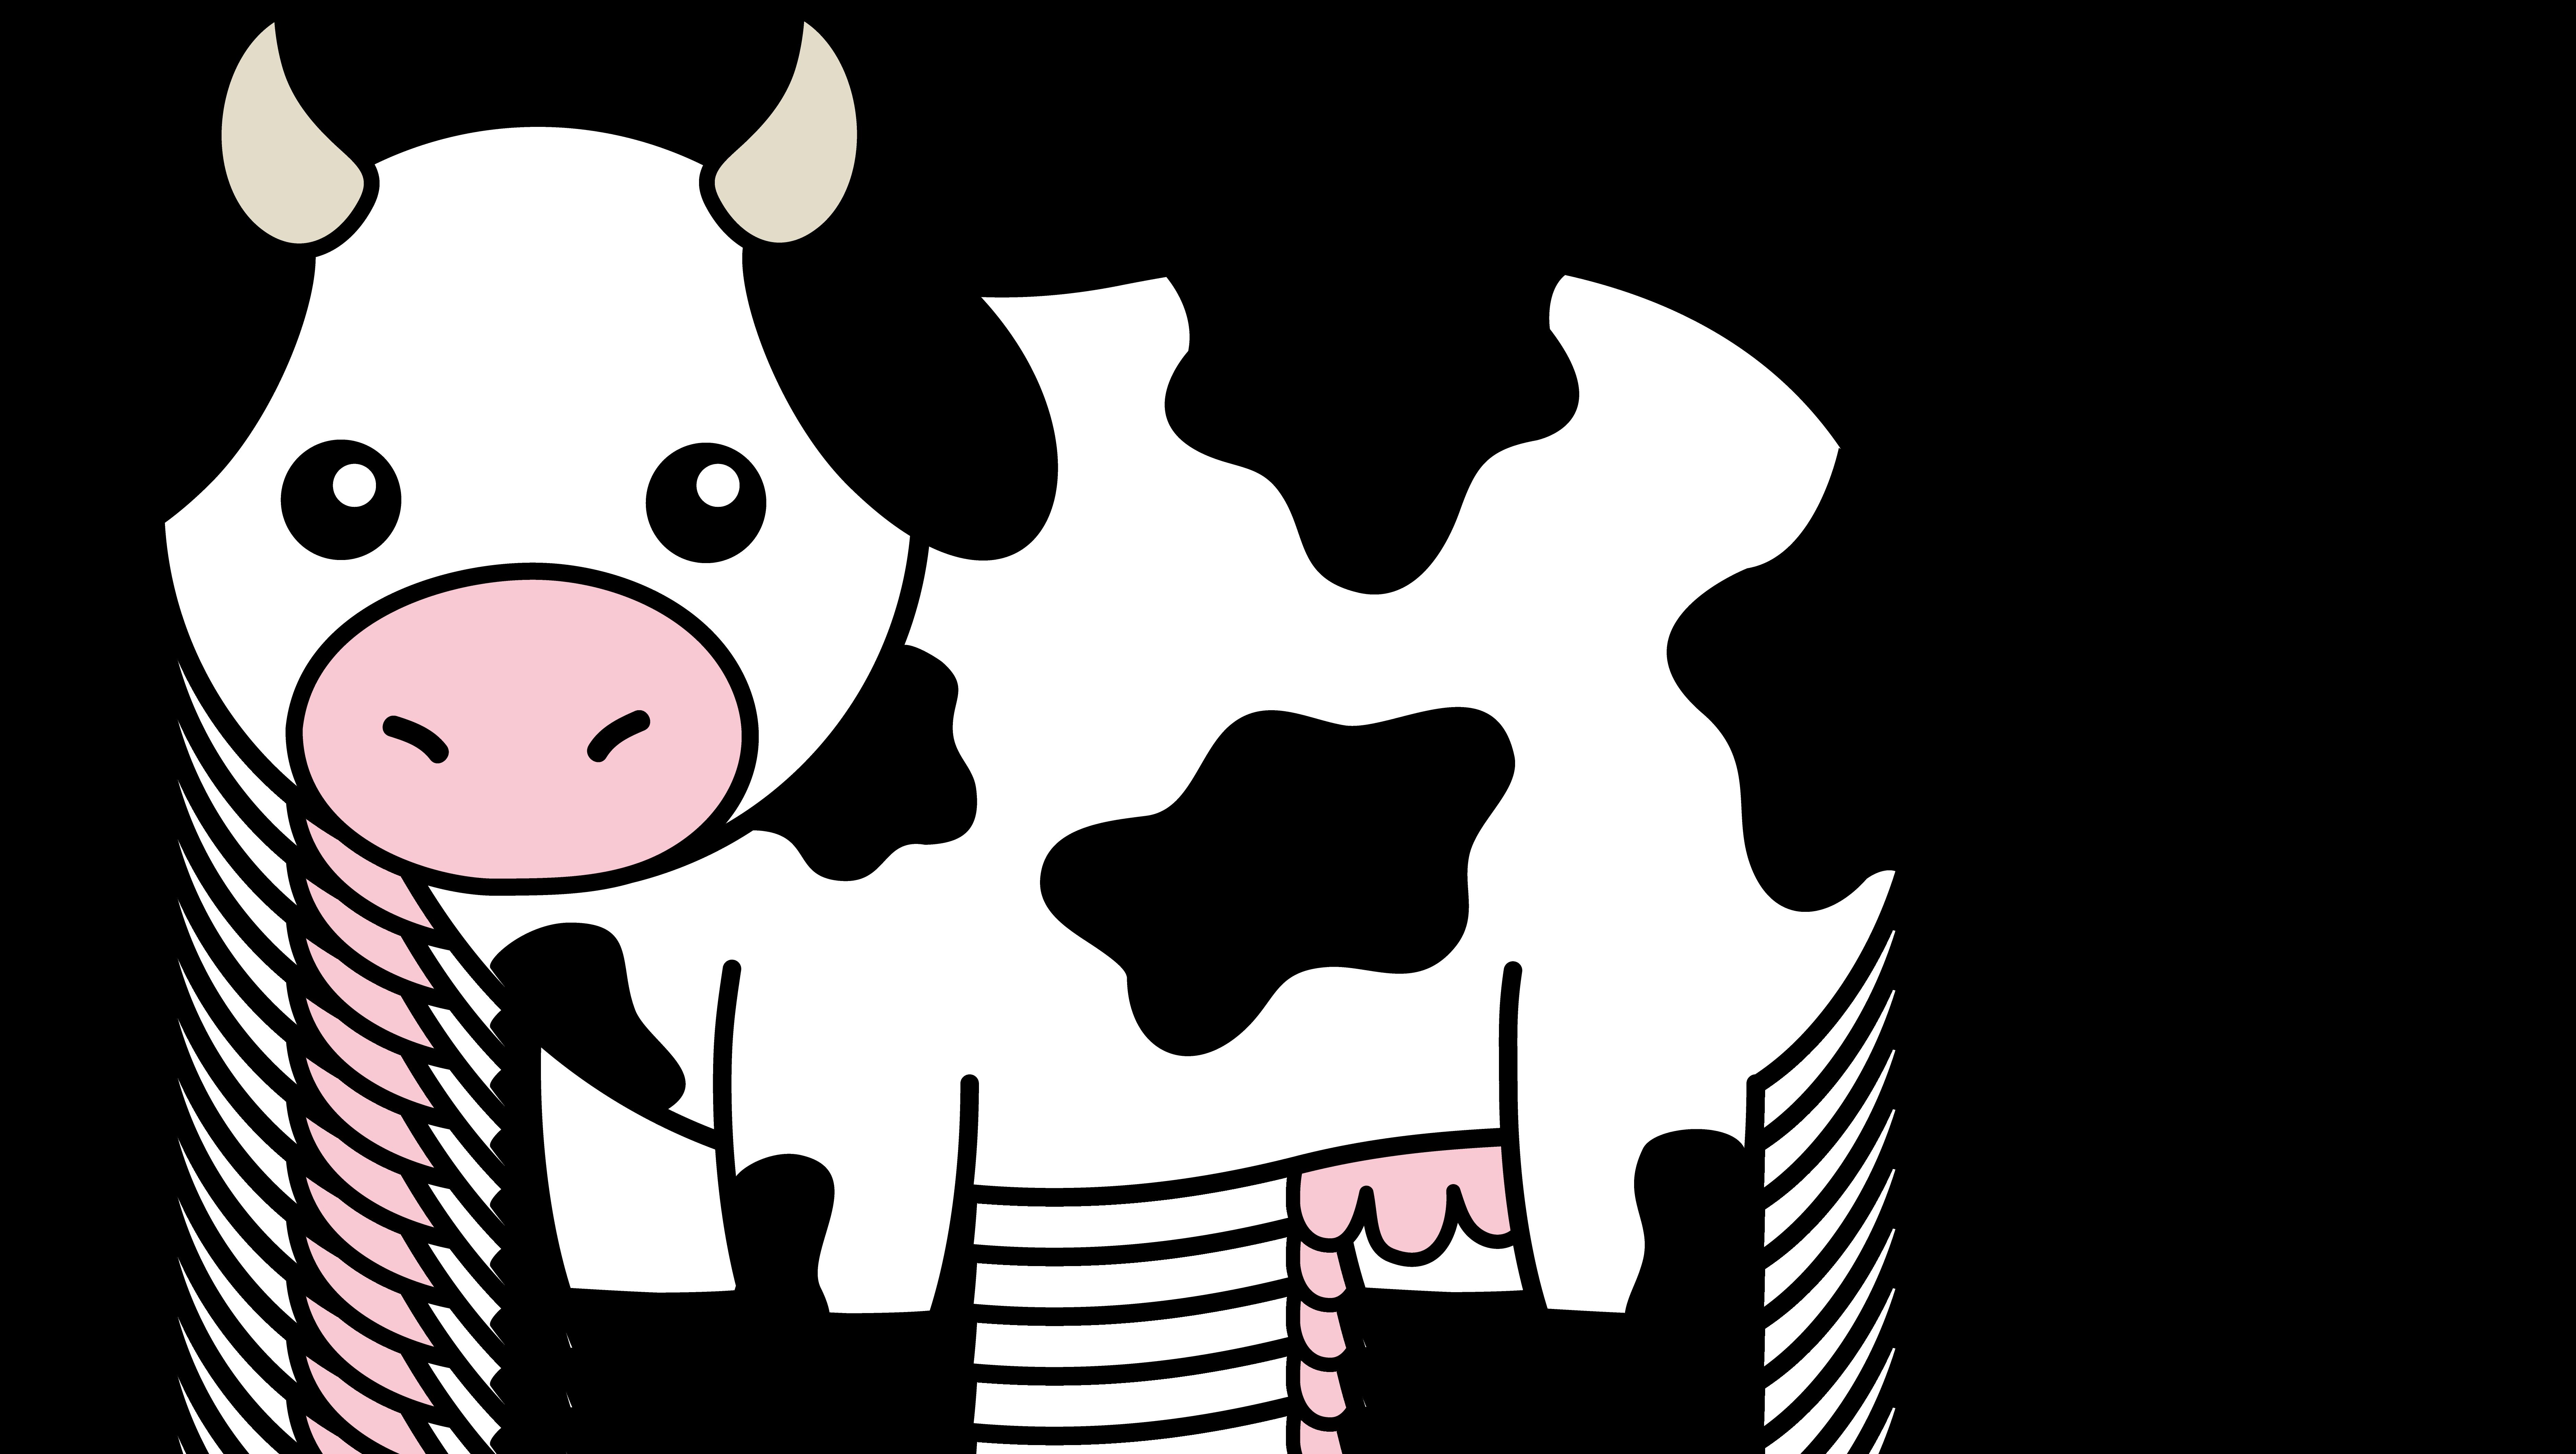 Cattle Clipart-Cattle Clipart-1